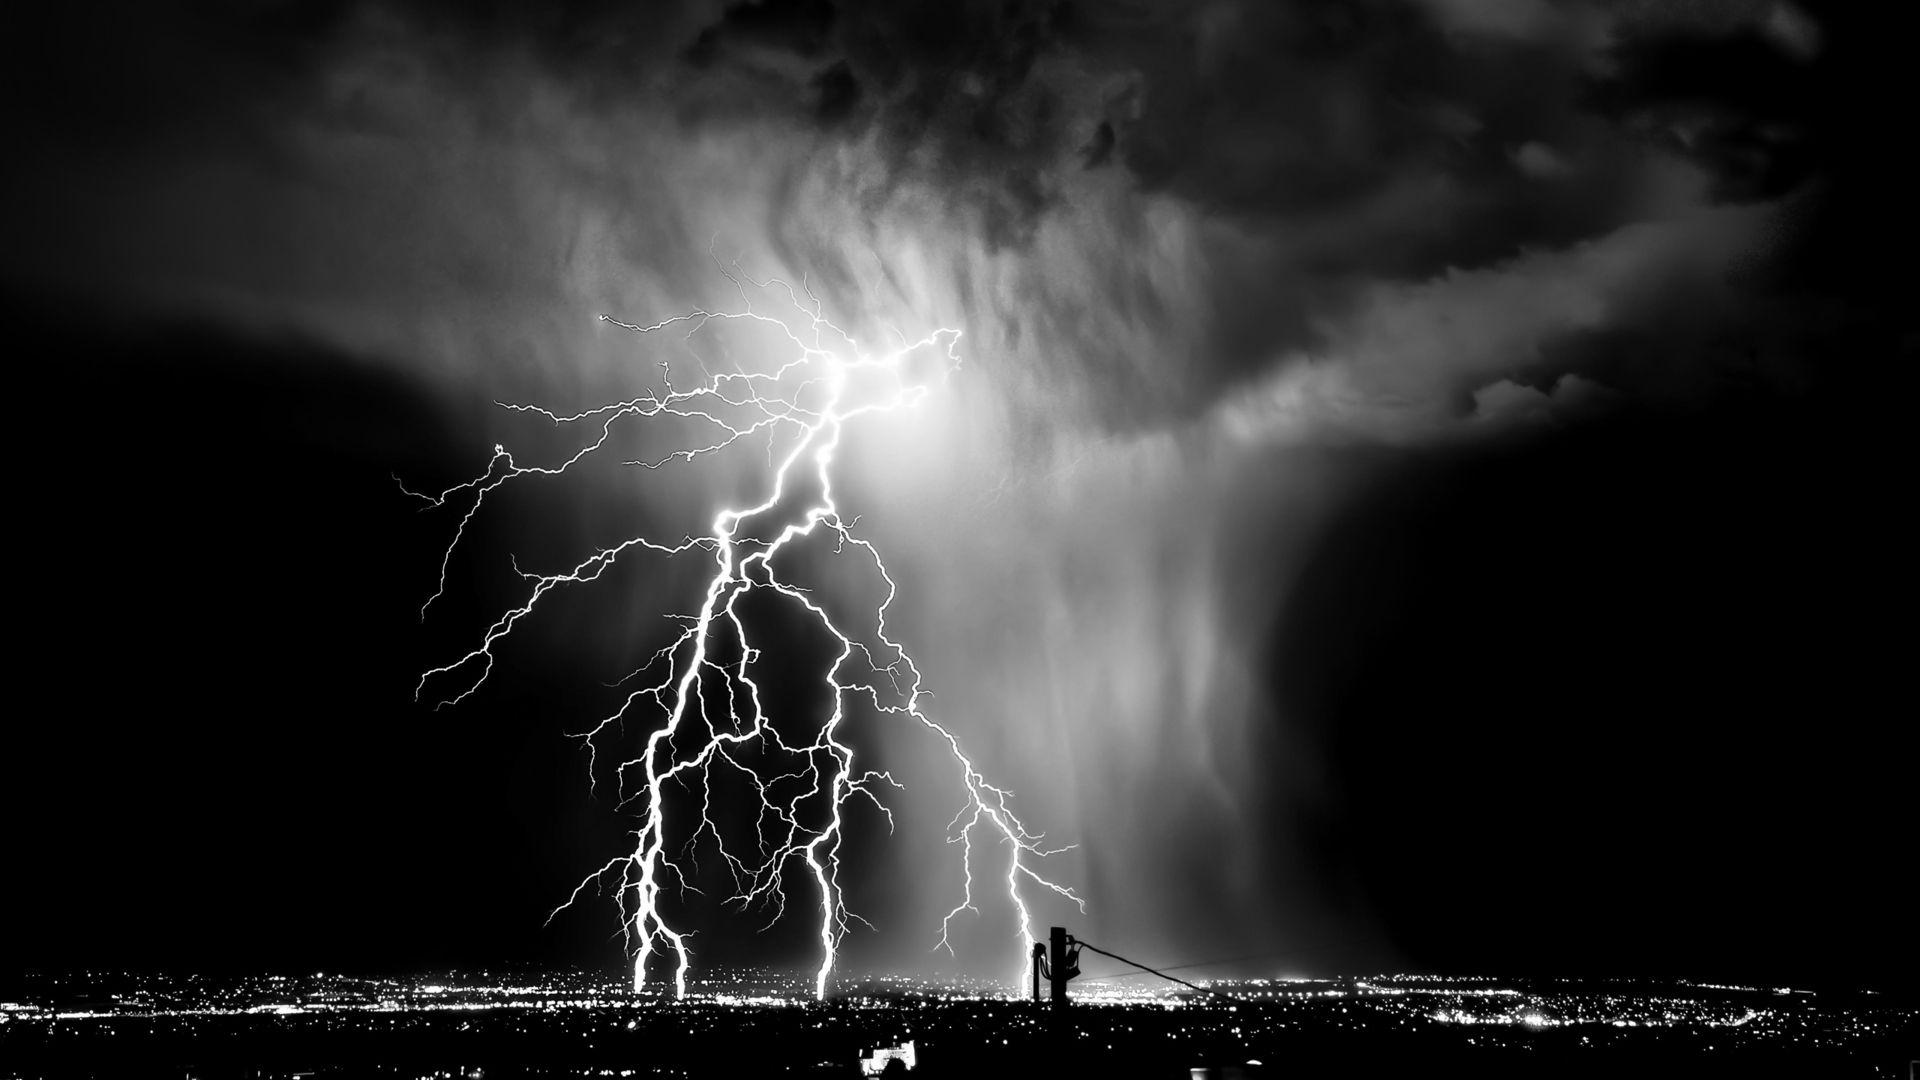 Tornado With Lightning Wallpaper Hd 28f Jpg 1920 1080 Lightning Photography Background Images Rain Wallpapers